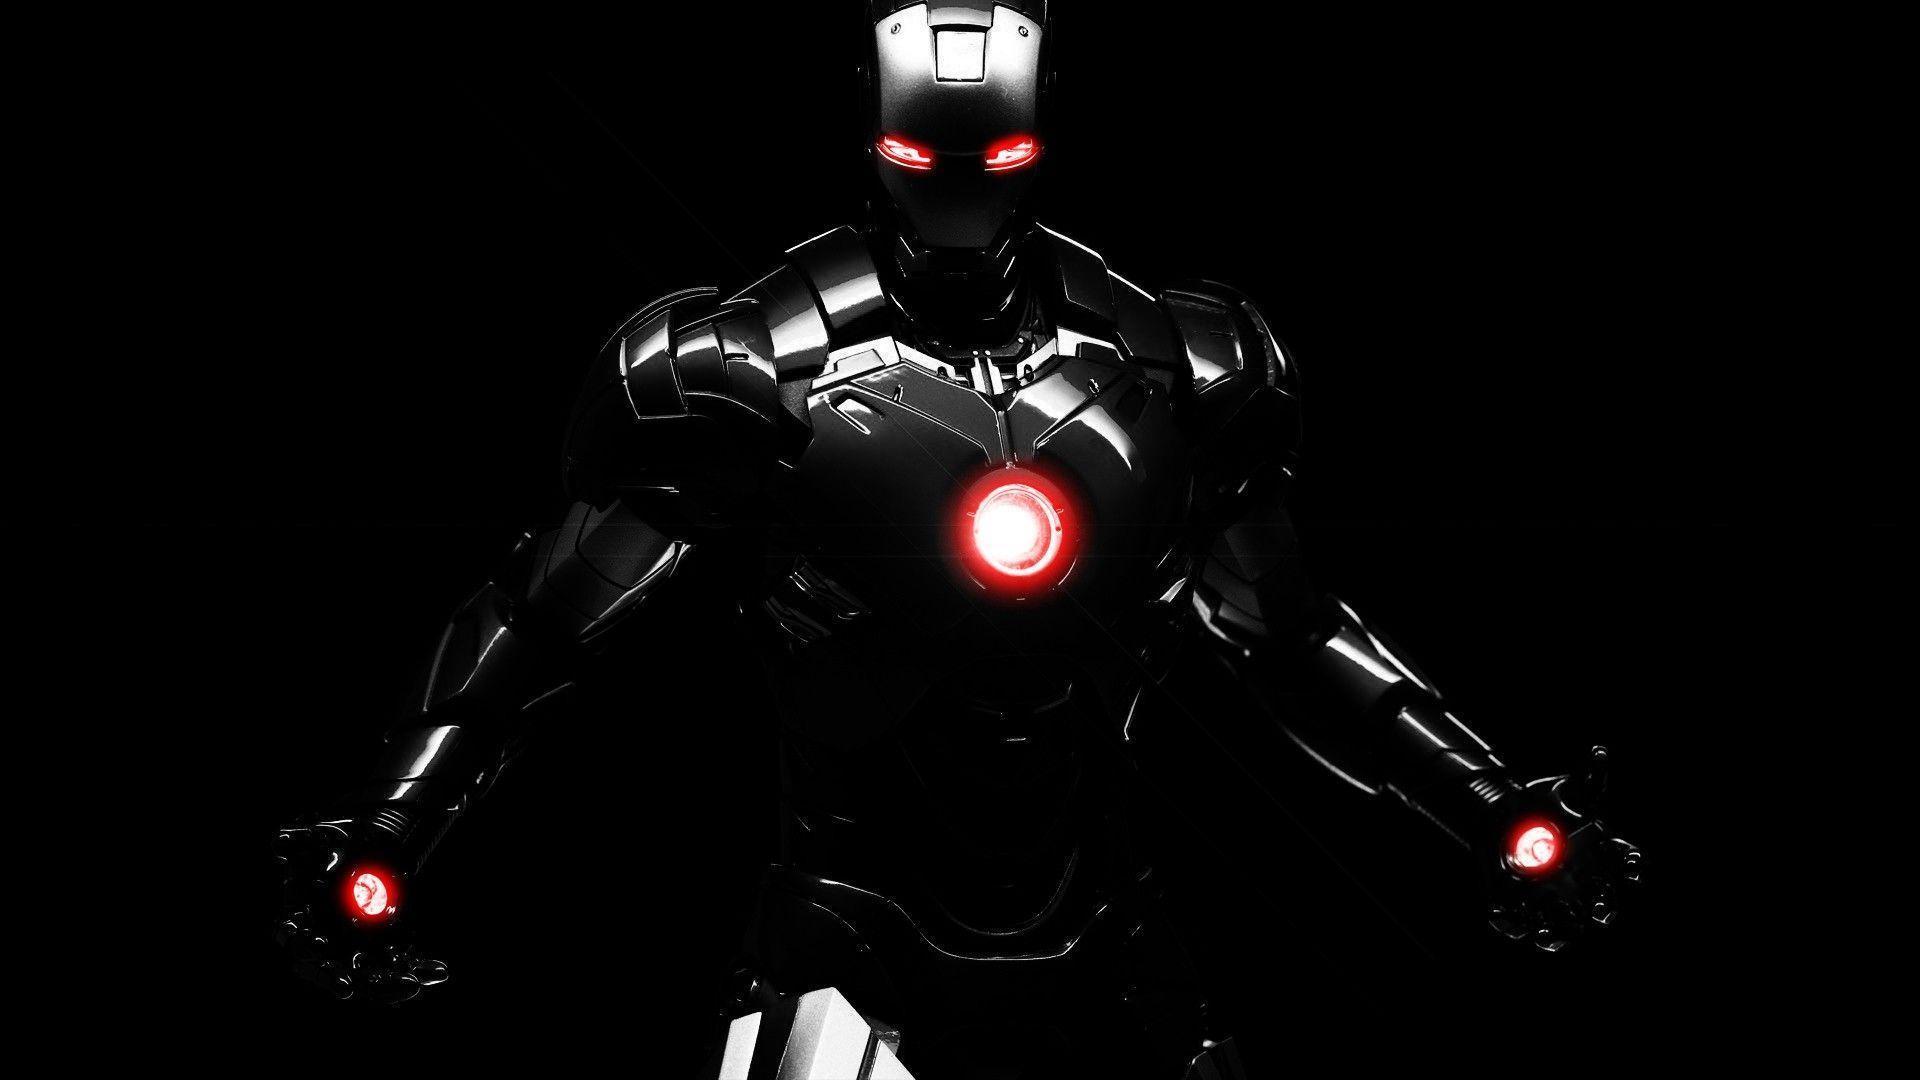 Iron Man 4 Strange Movie Wallpaper HD #7679 Wallpaper | High ...